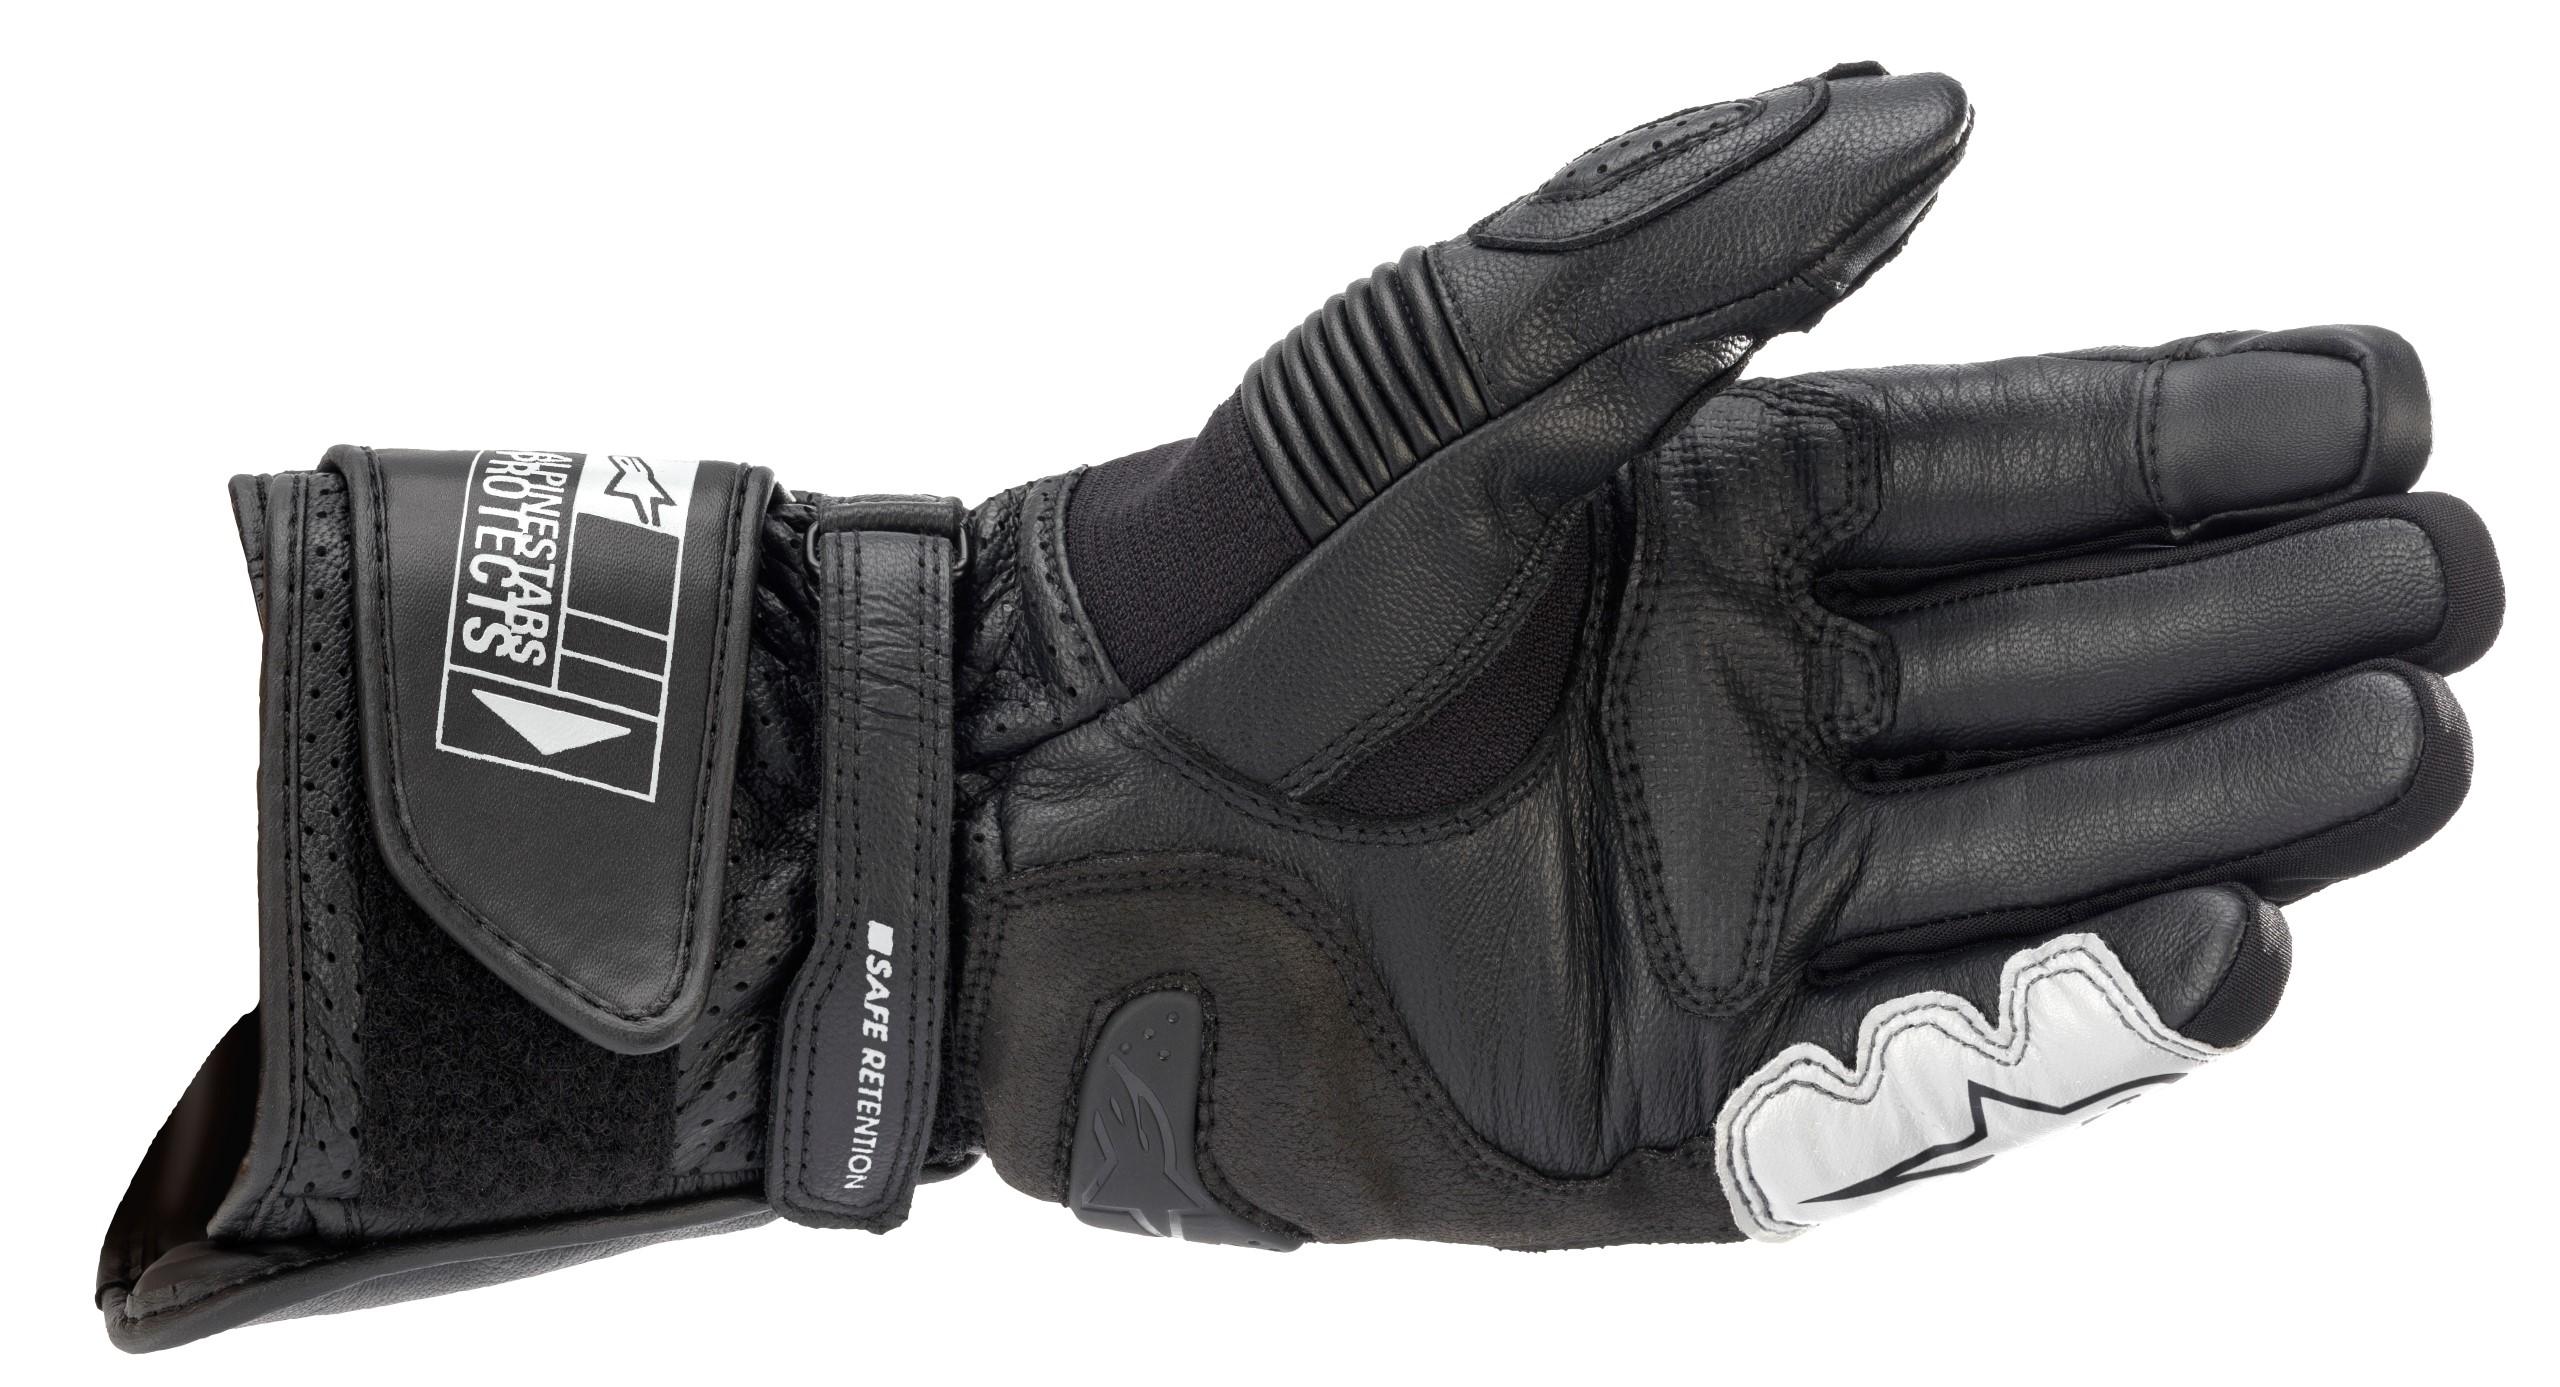 3558221-12-ba_sp-2-v3-glove